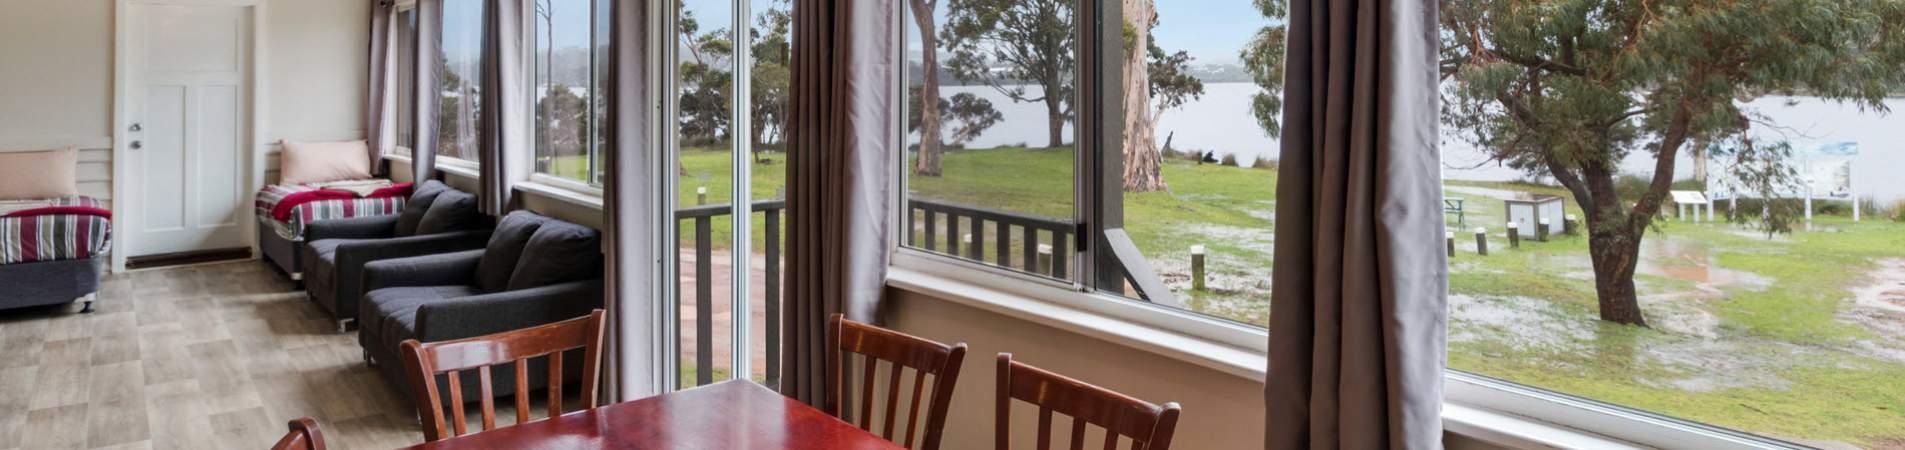 walpole rest point caravan park accommodation - banner 1